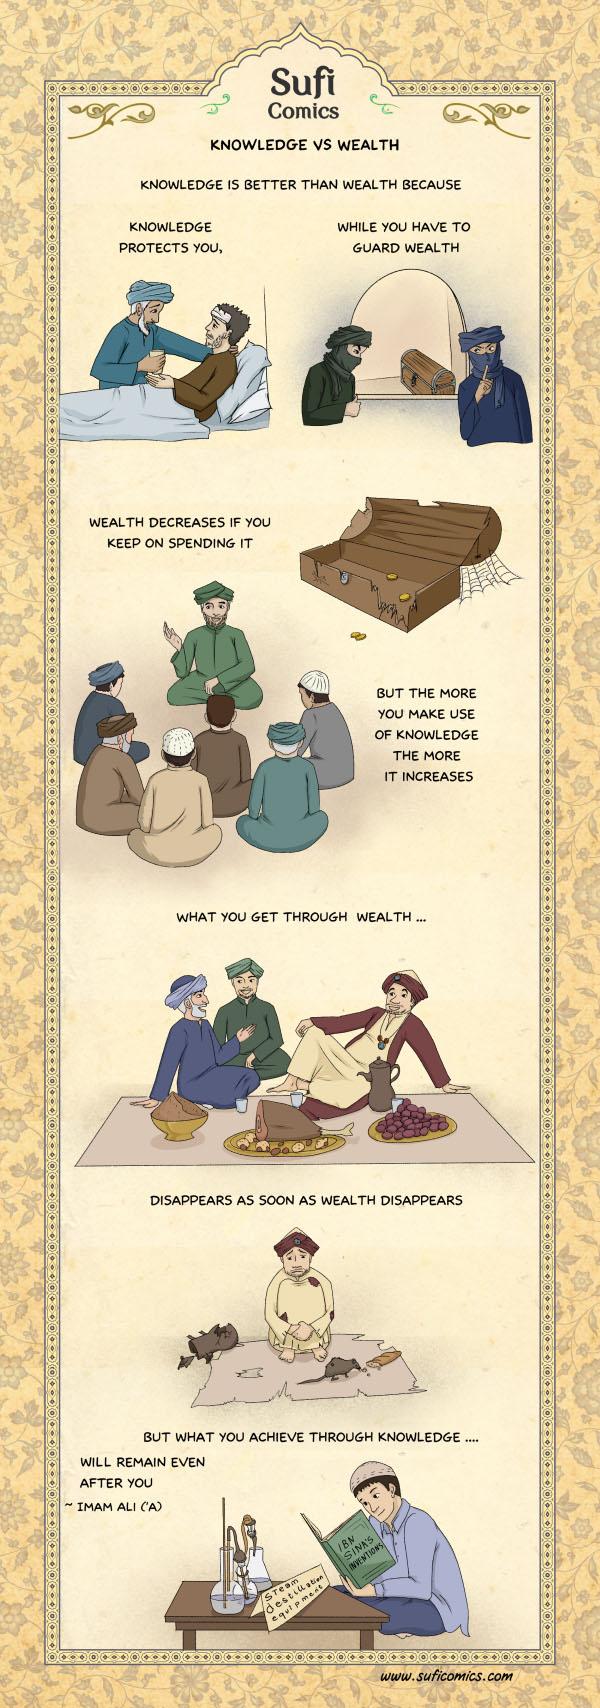 sufi-comics-knowledge-vs-wealth